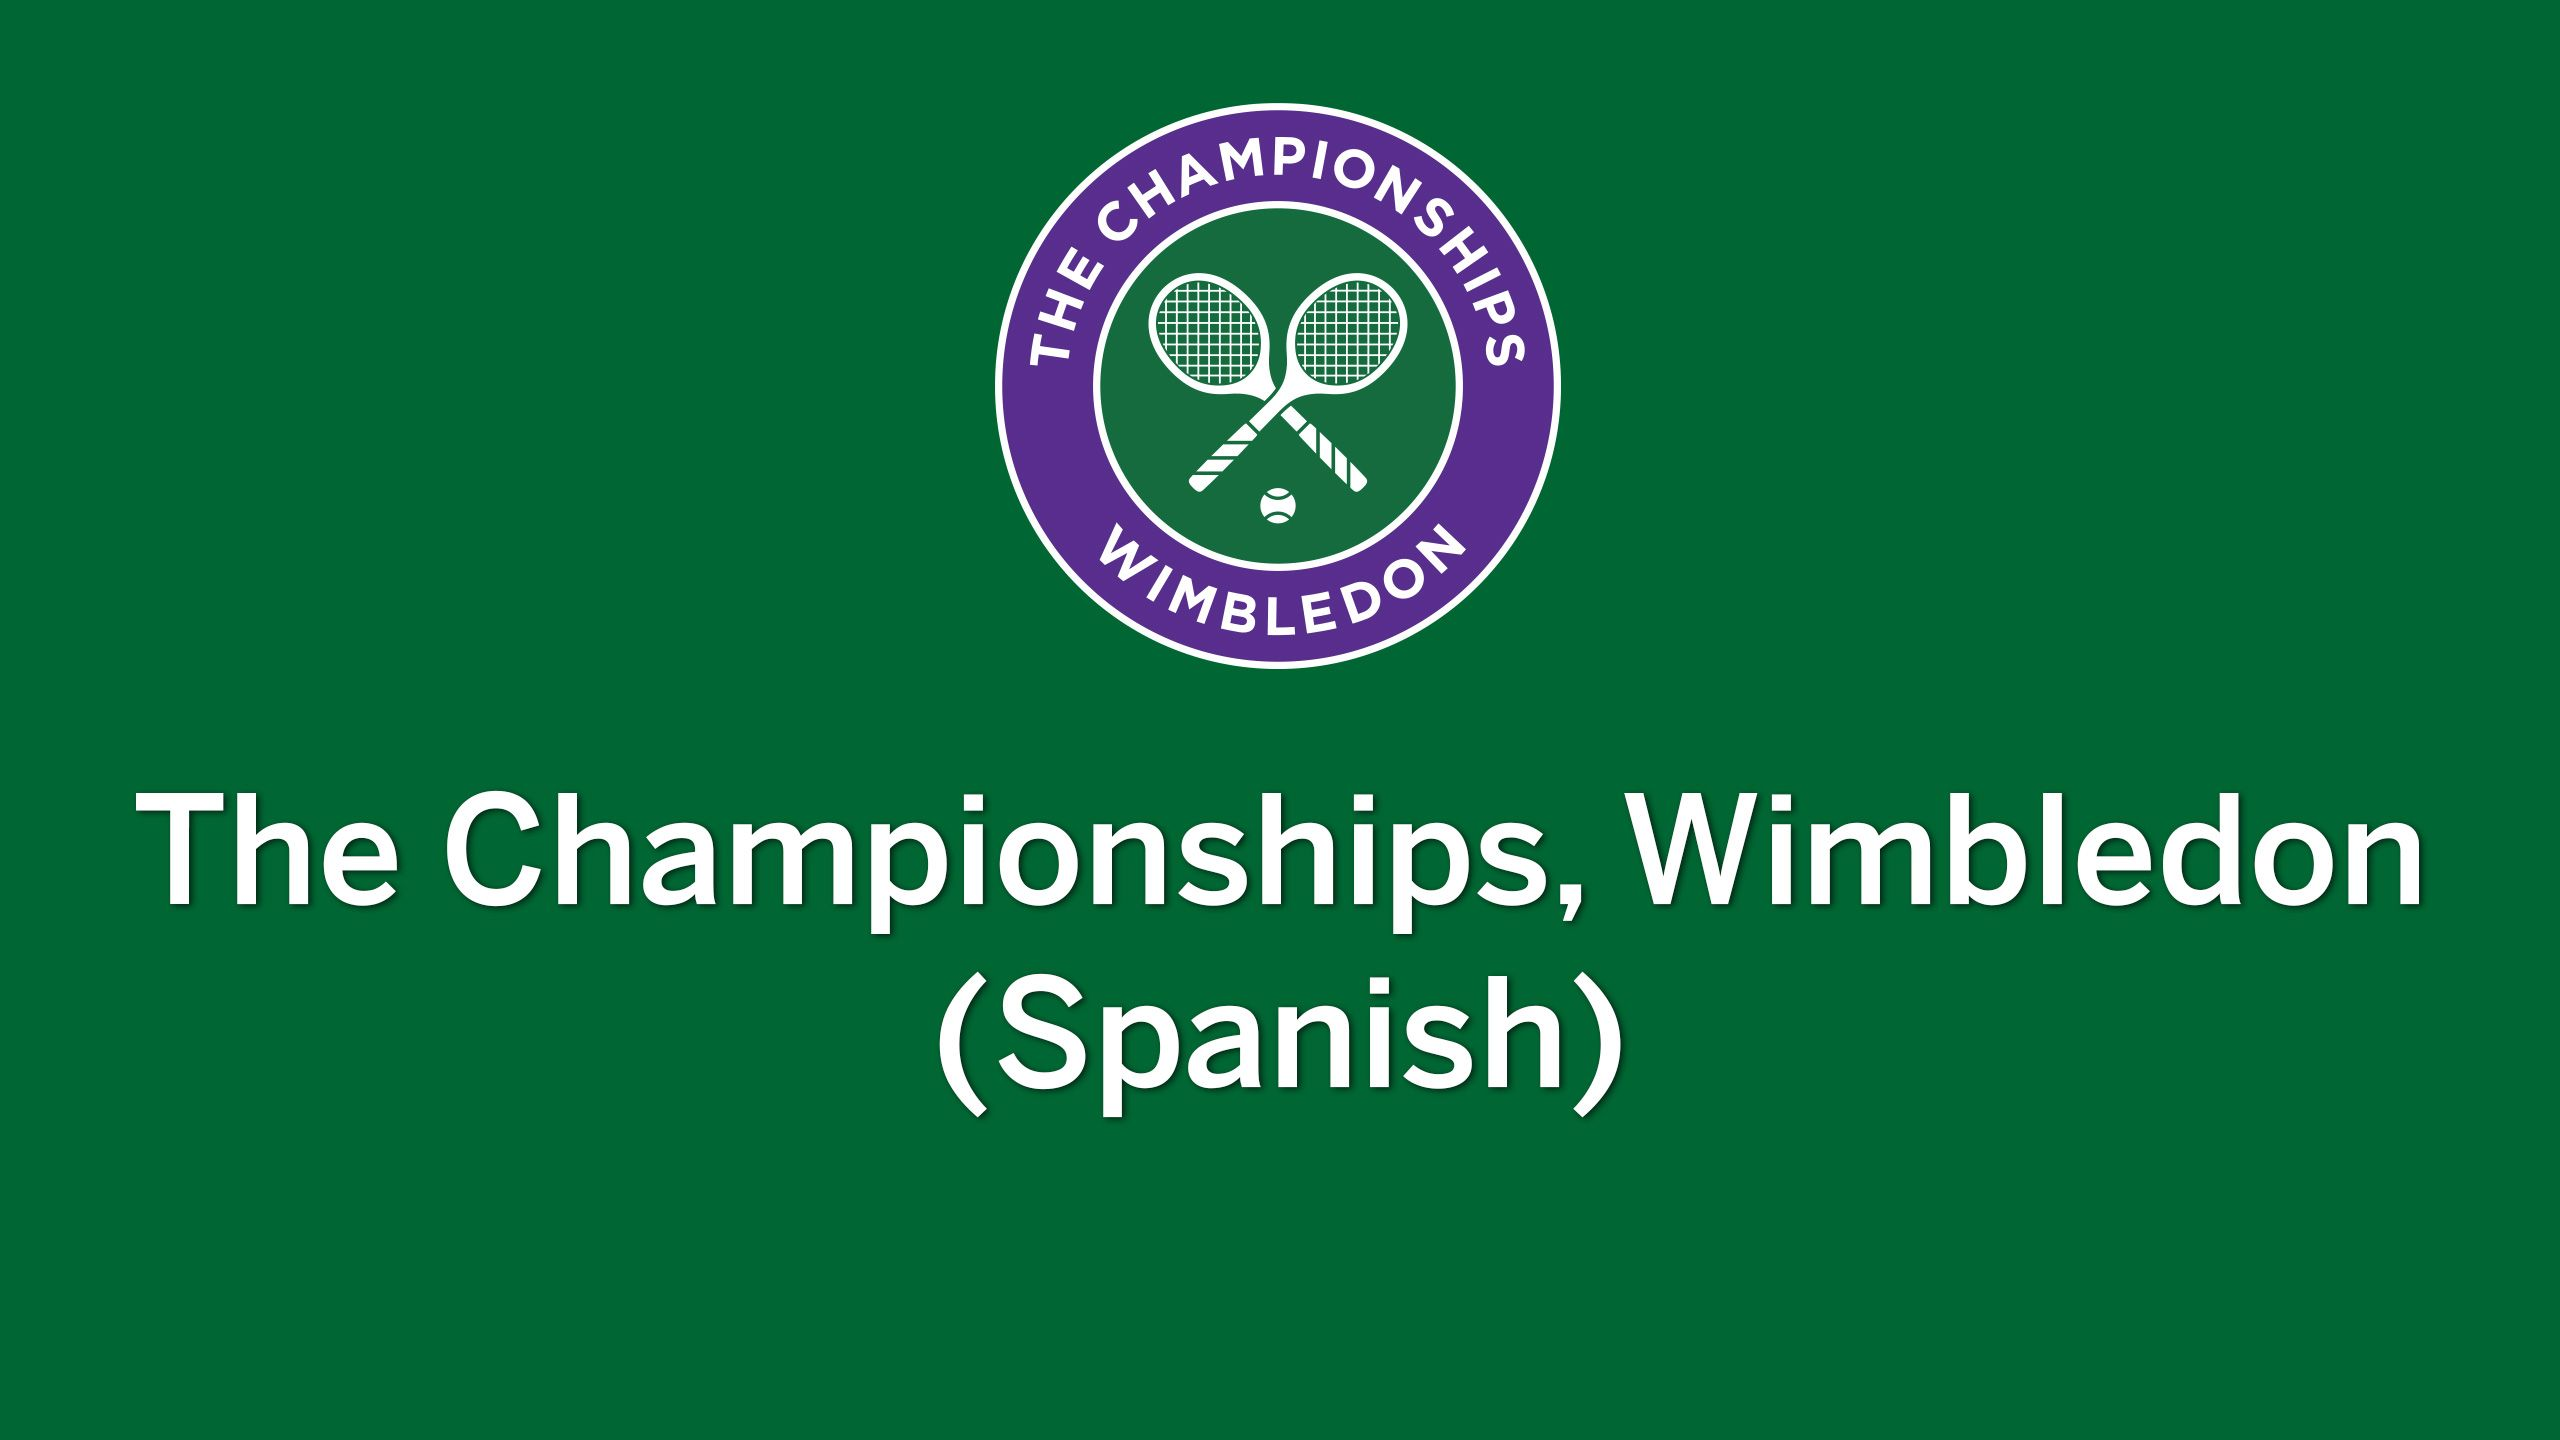 Wimbledon Tennis Championships - In Spanish (Gentlemen's Championship)